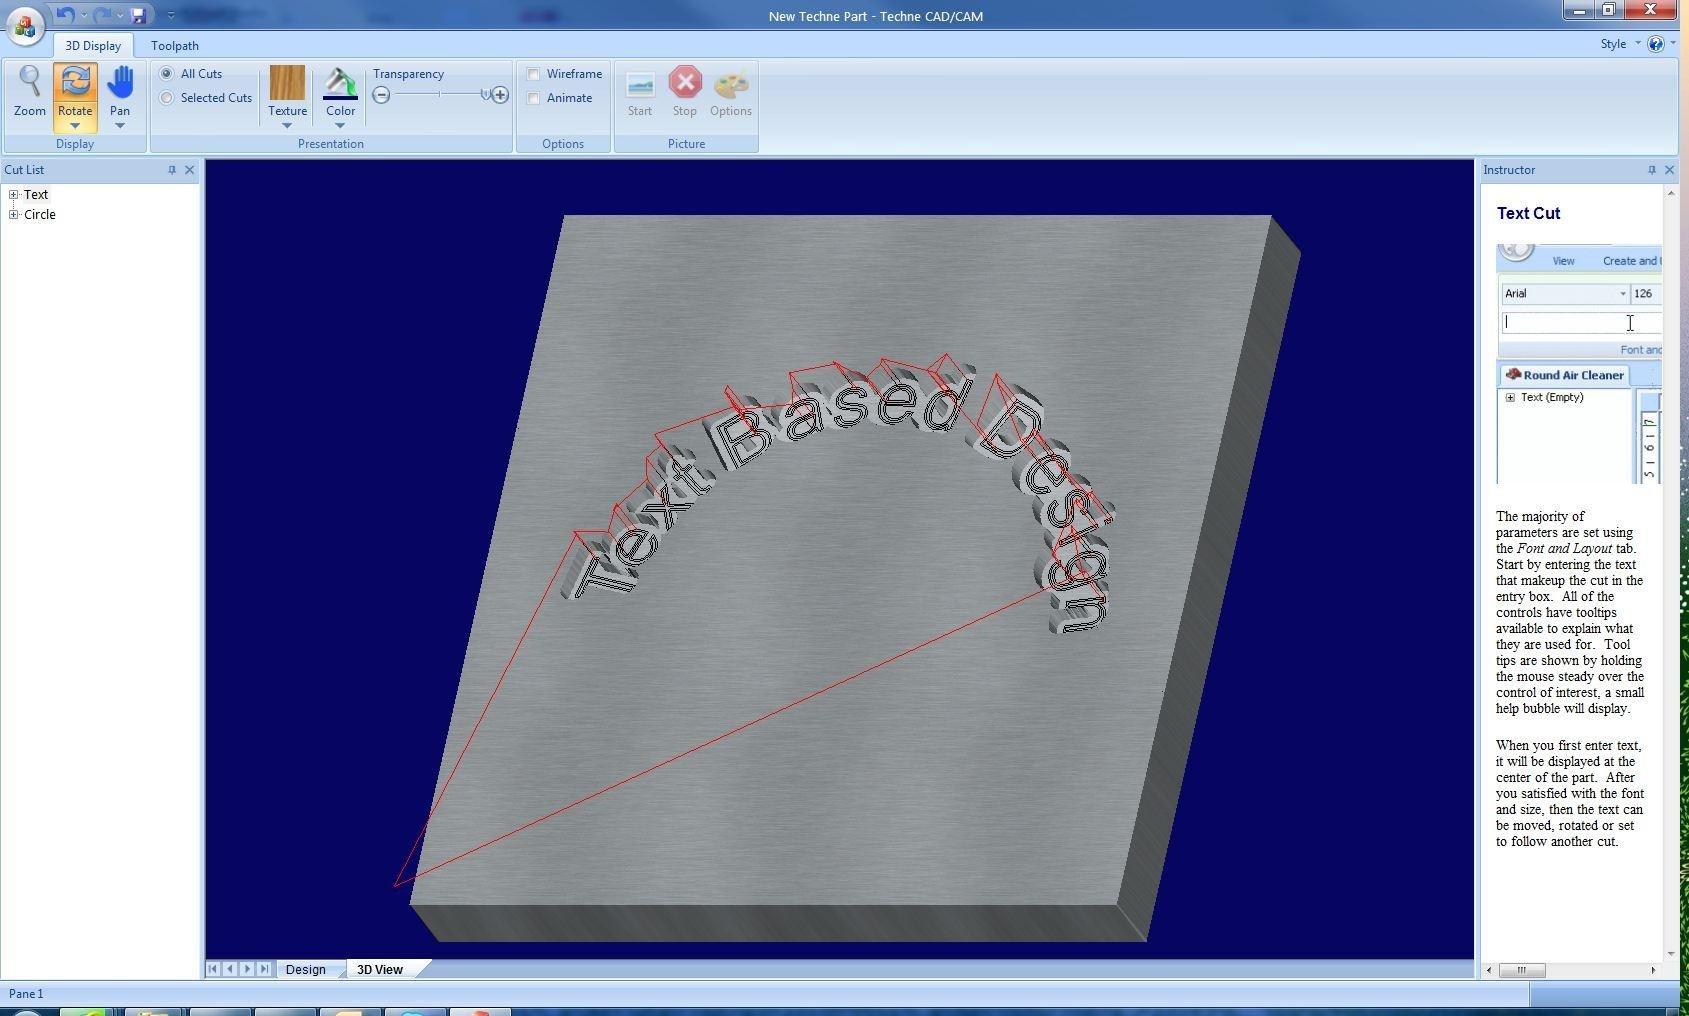 cnc cad cam software free download